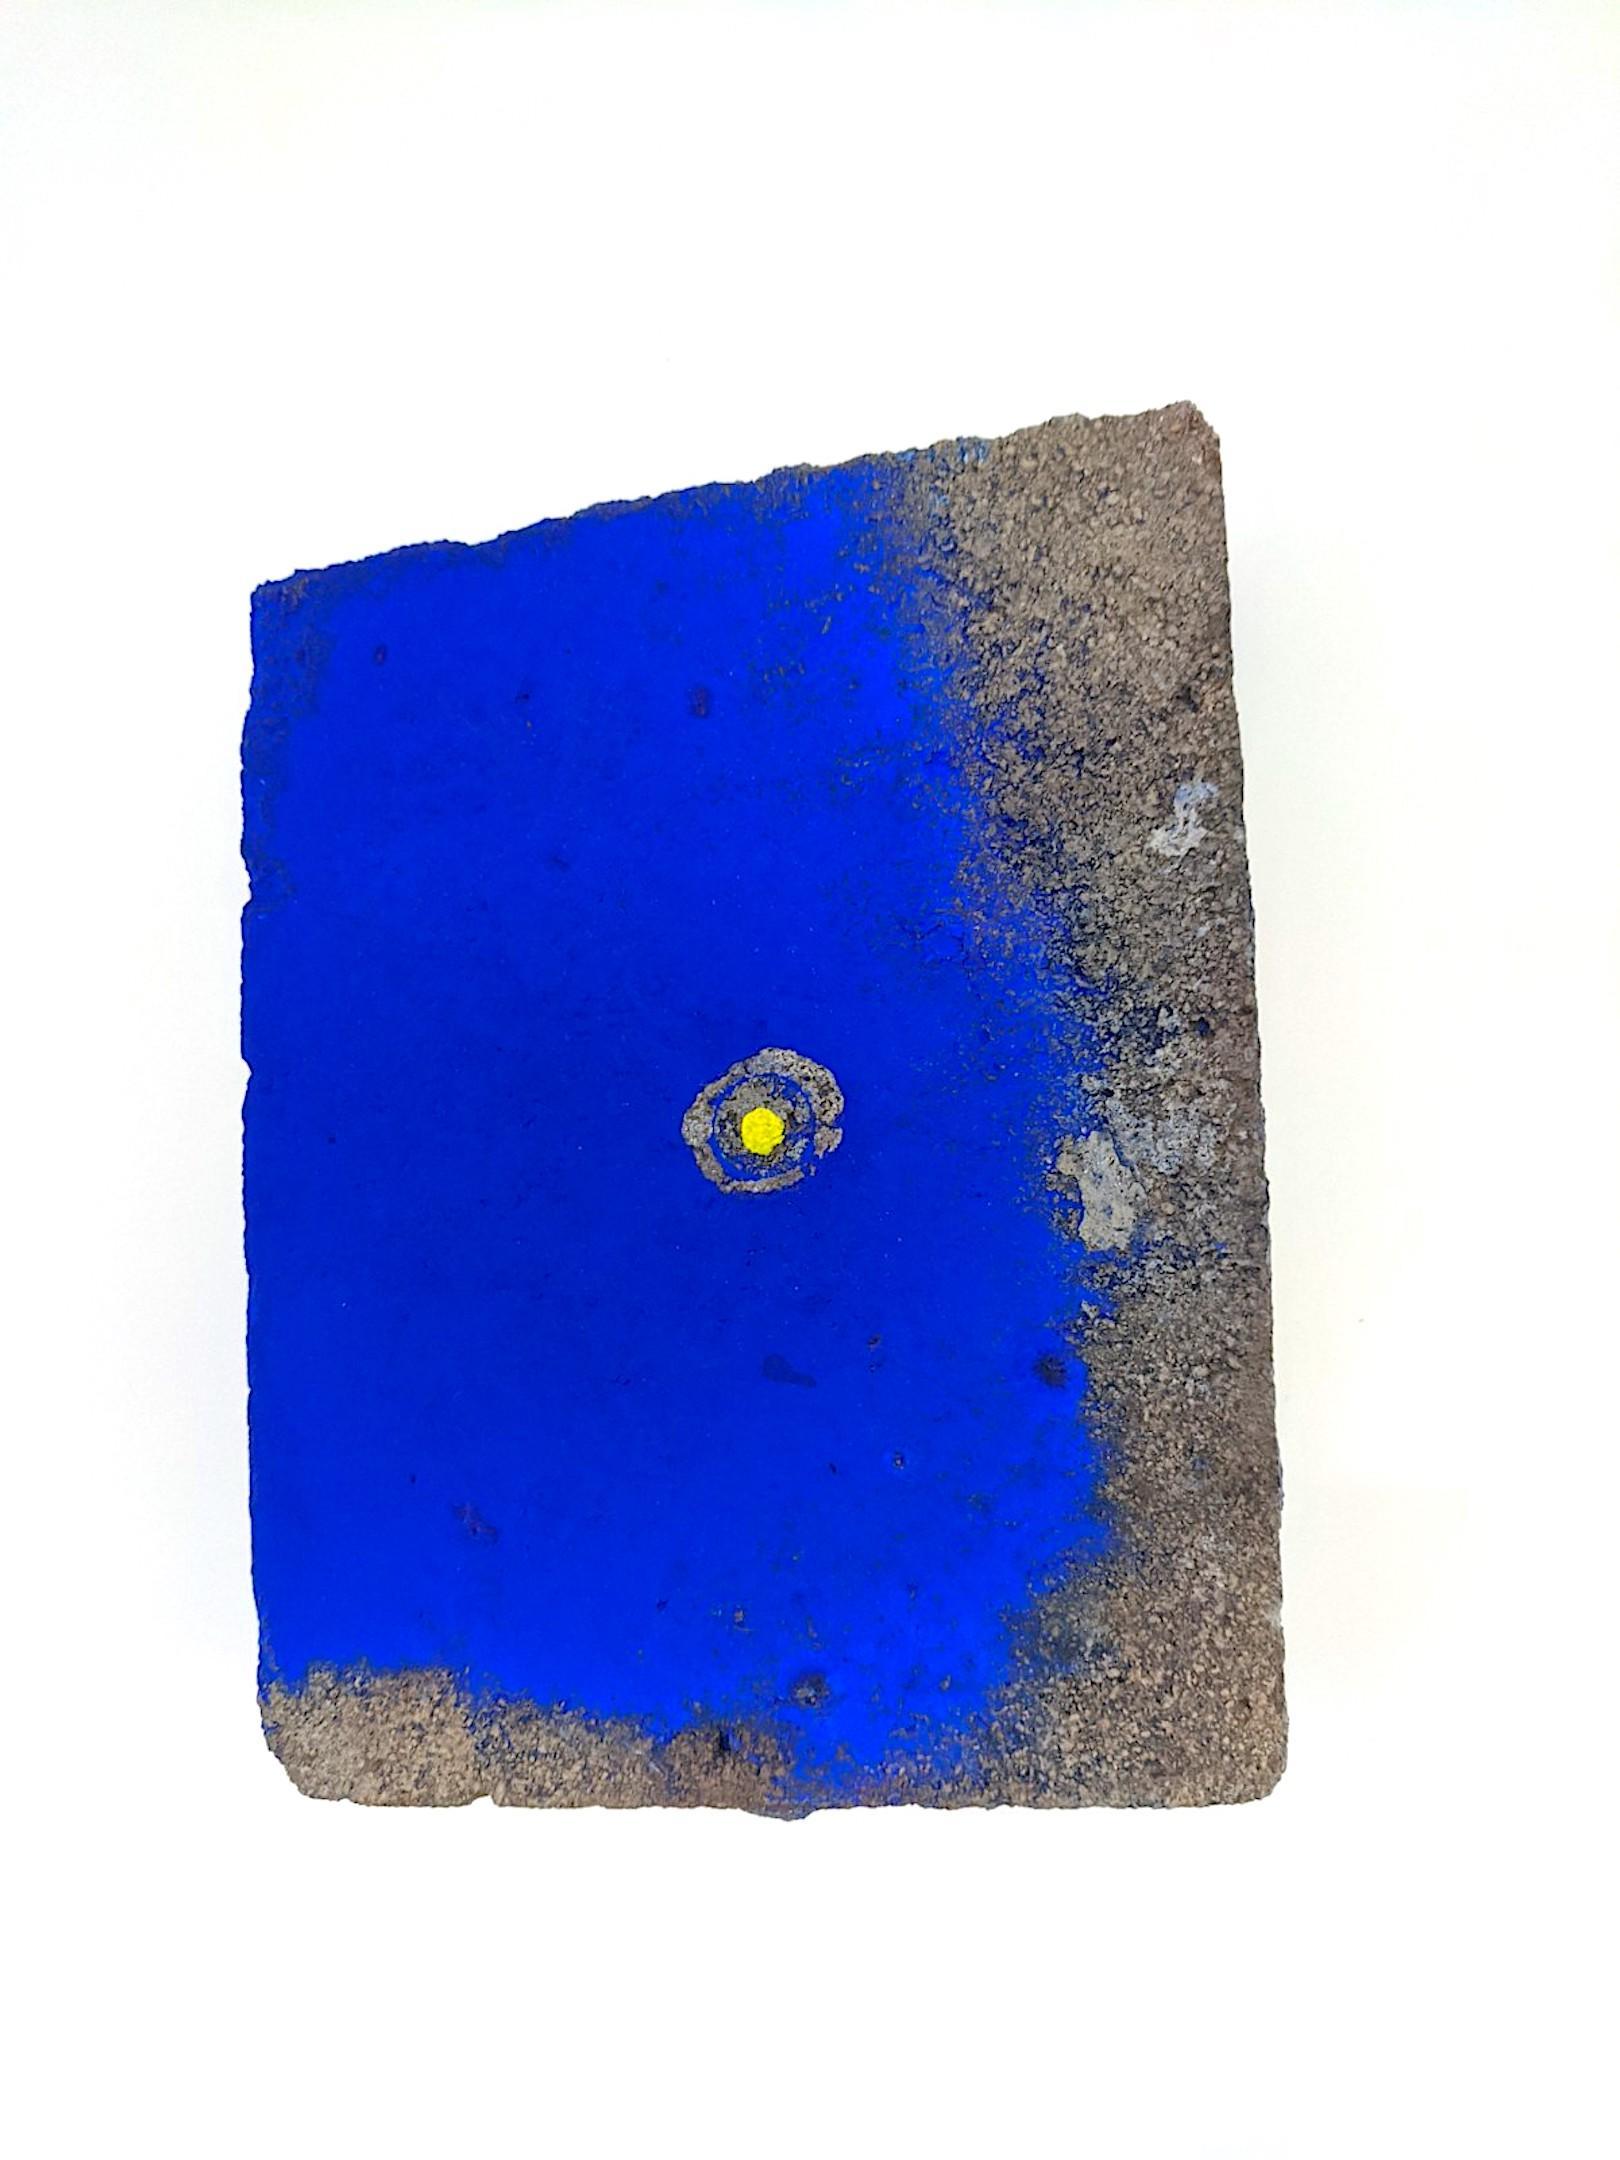 Ellen Hackl Fagan_Seeking the Sound of Cobalt Blue_Paver 3_2020_found object